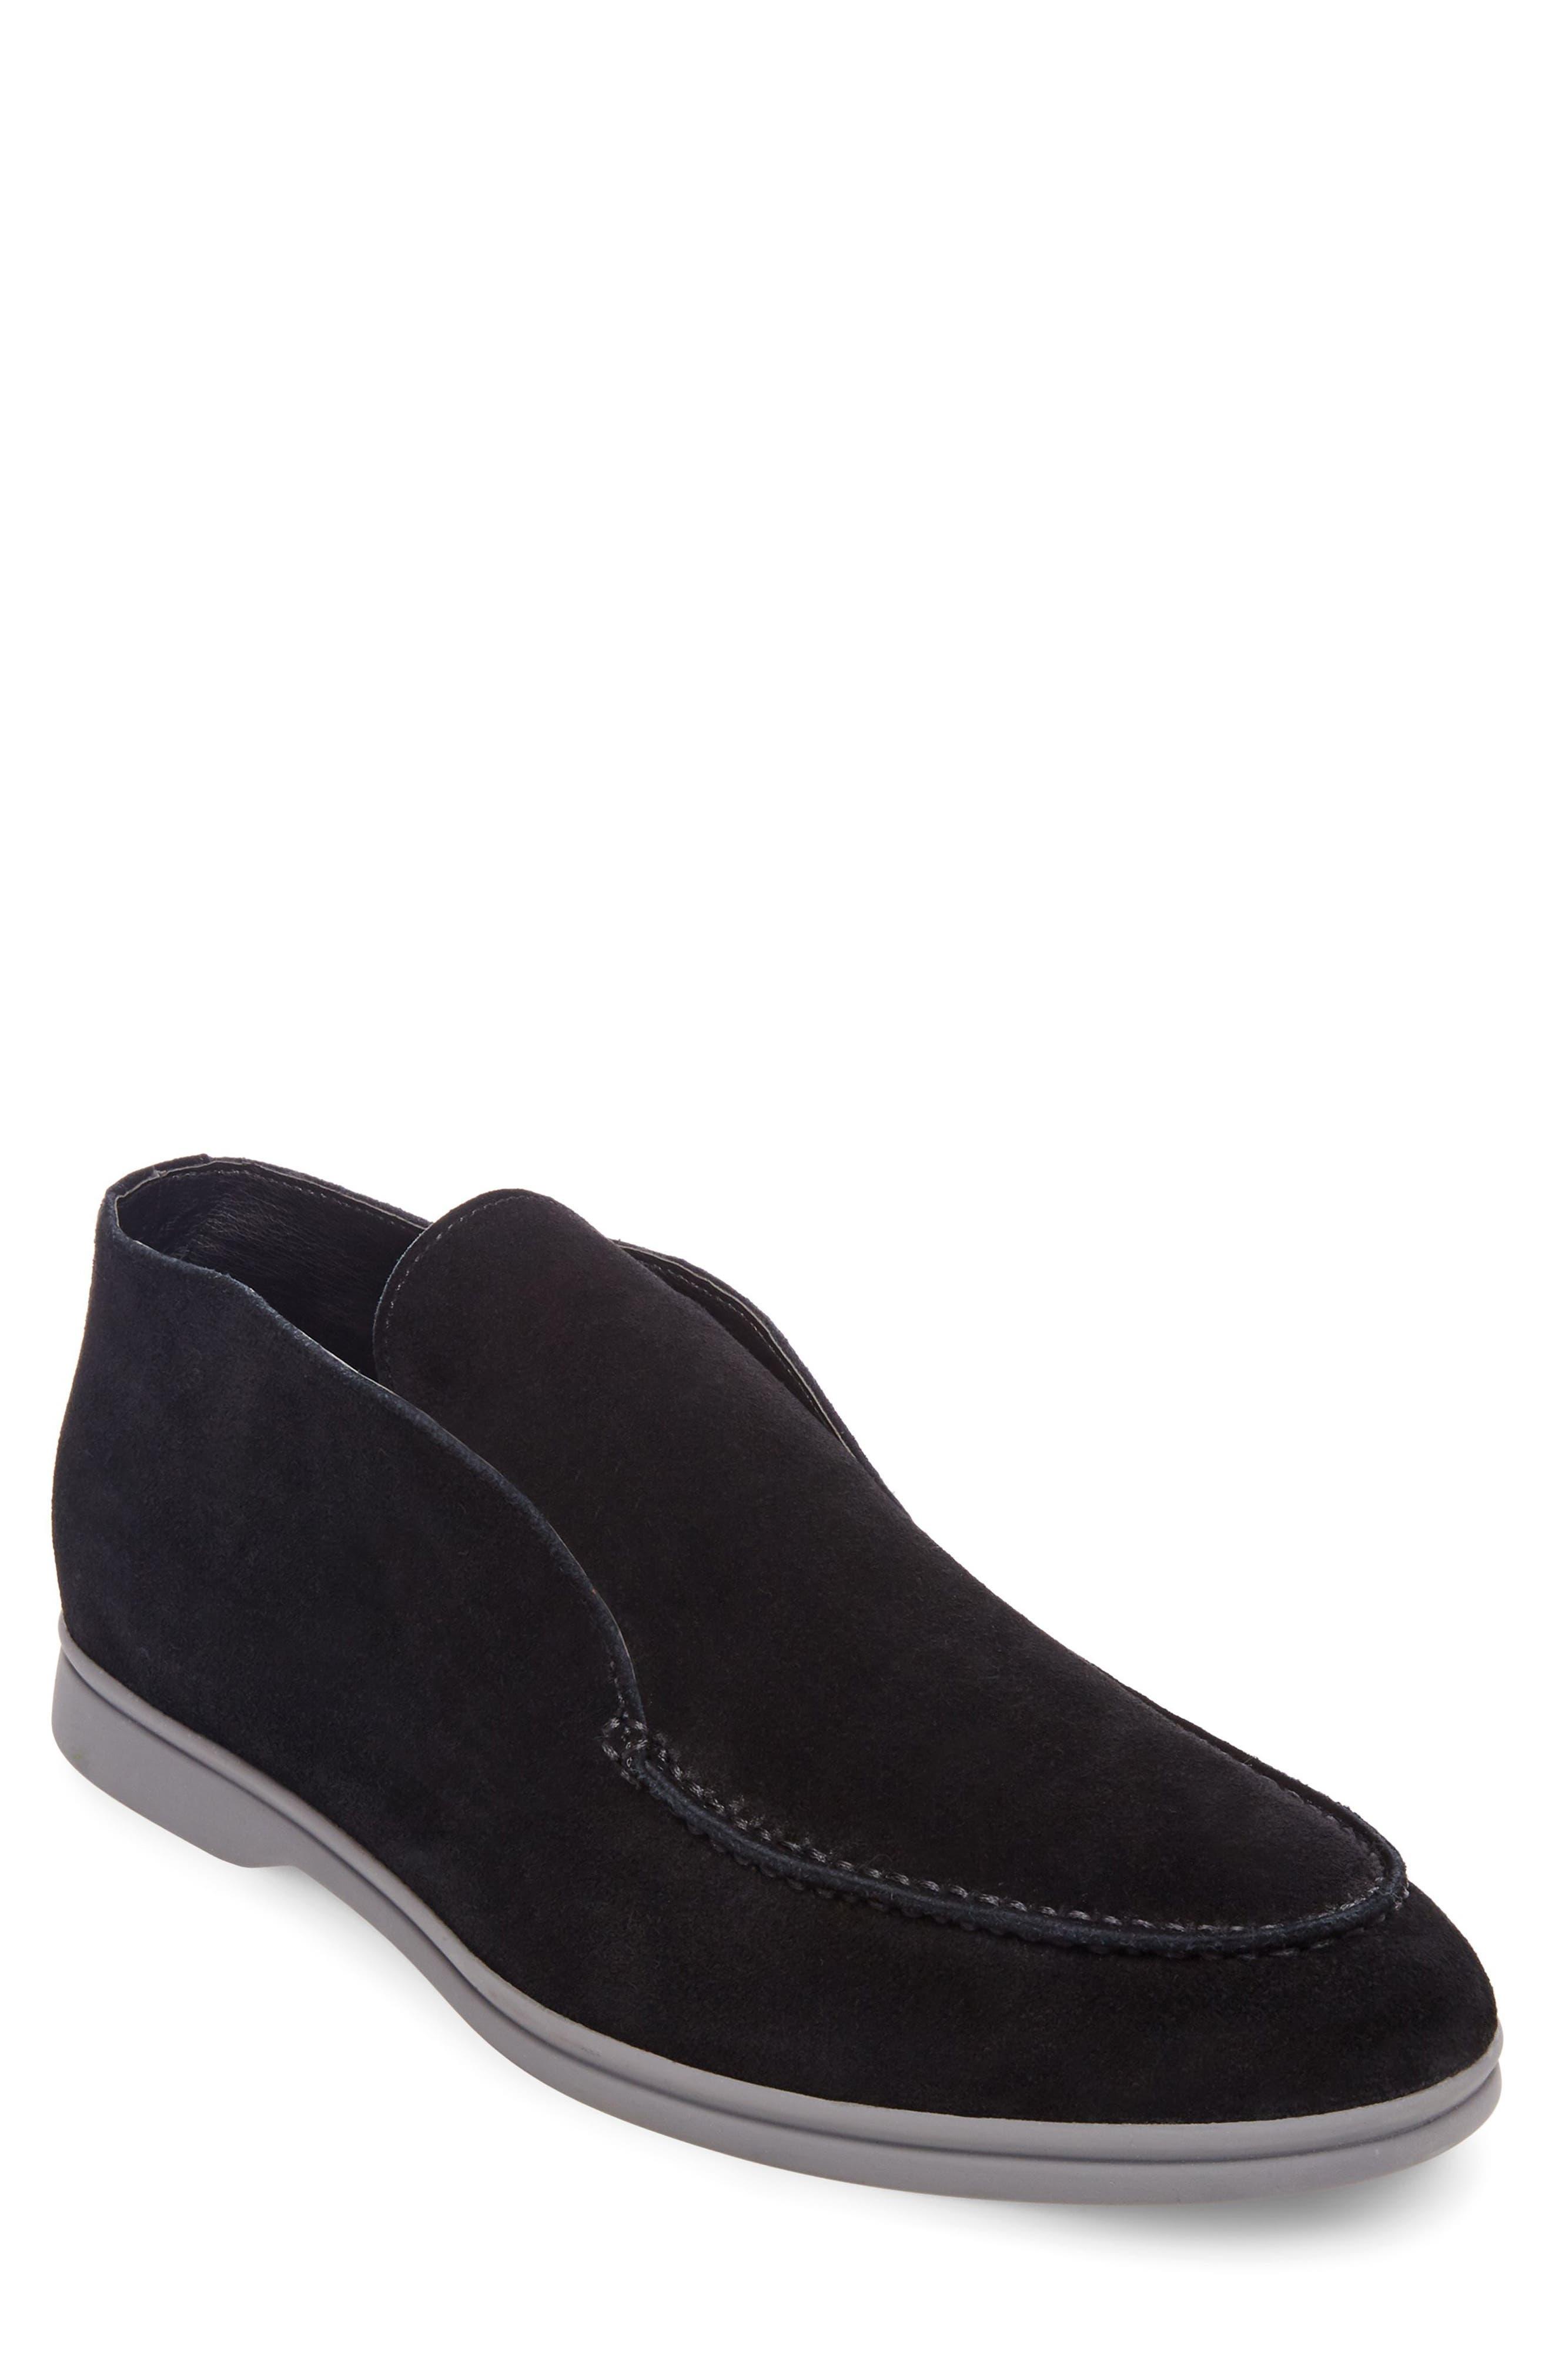 Boot,                         Main,                         color, BLACK SUEDE